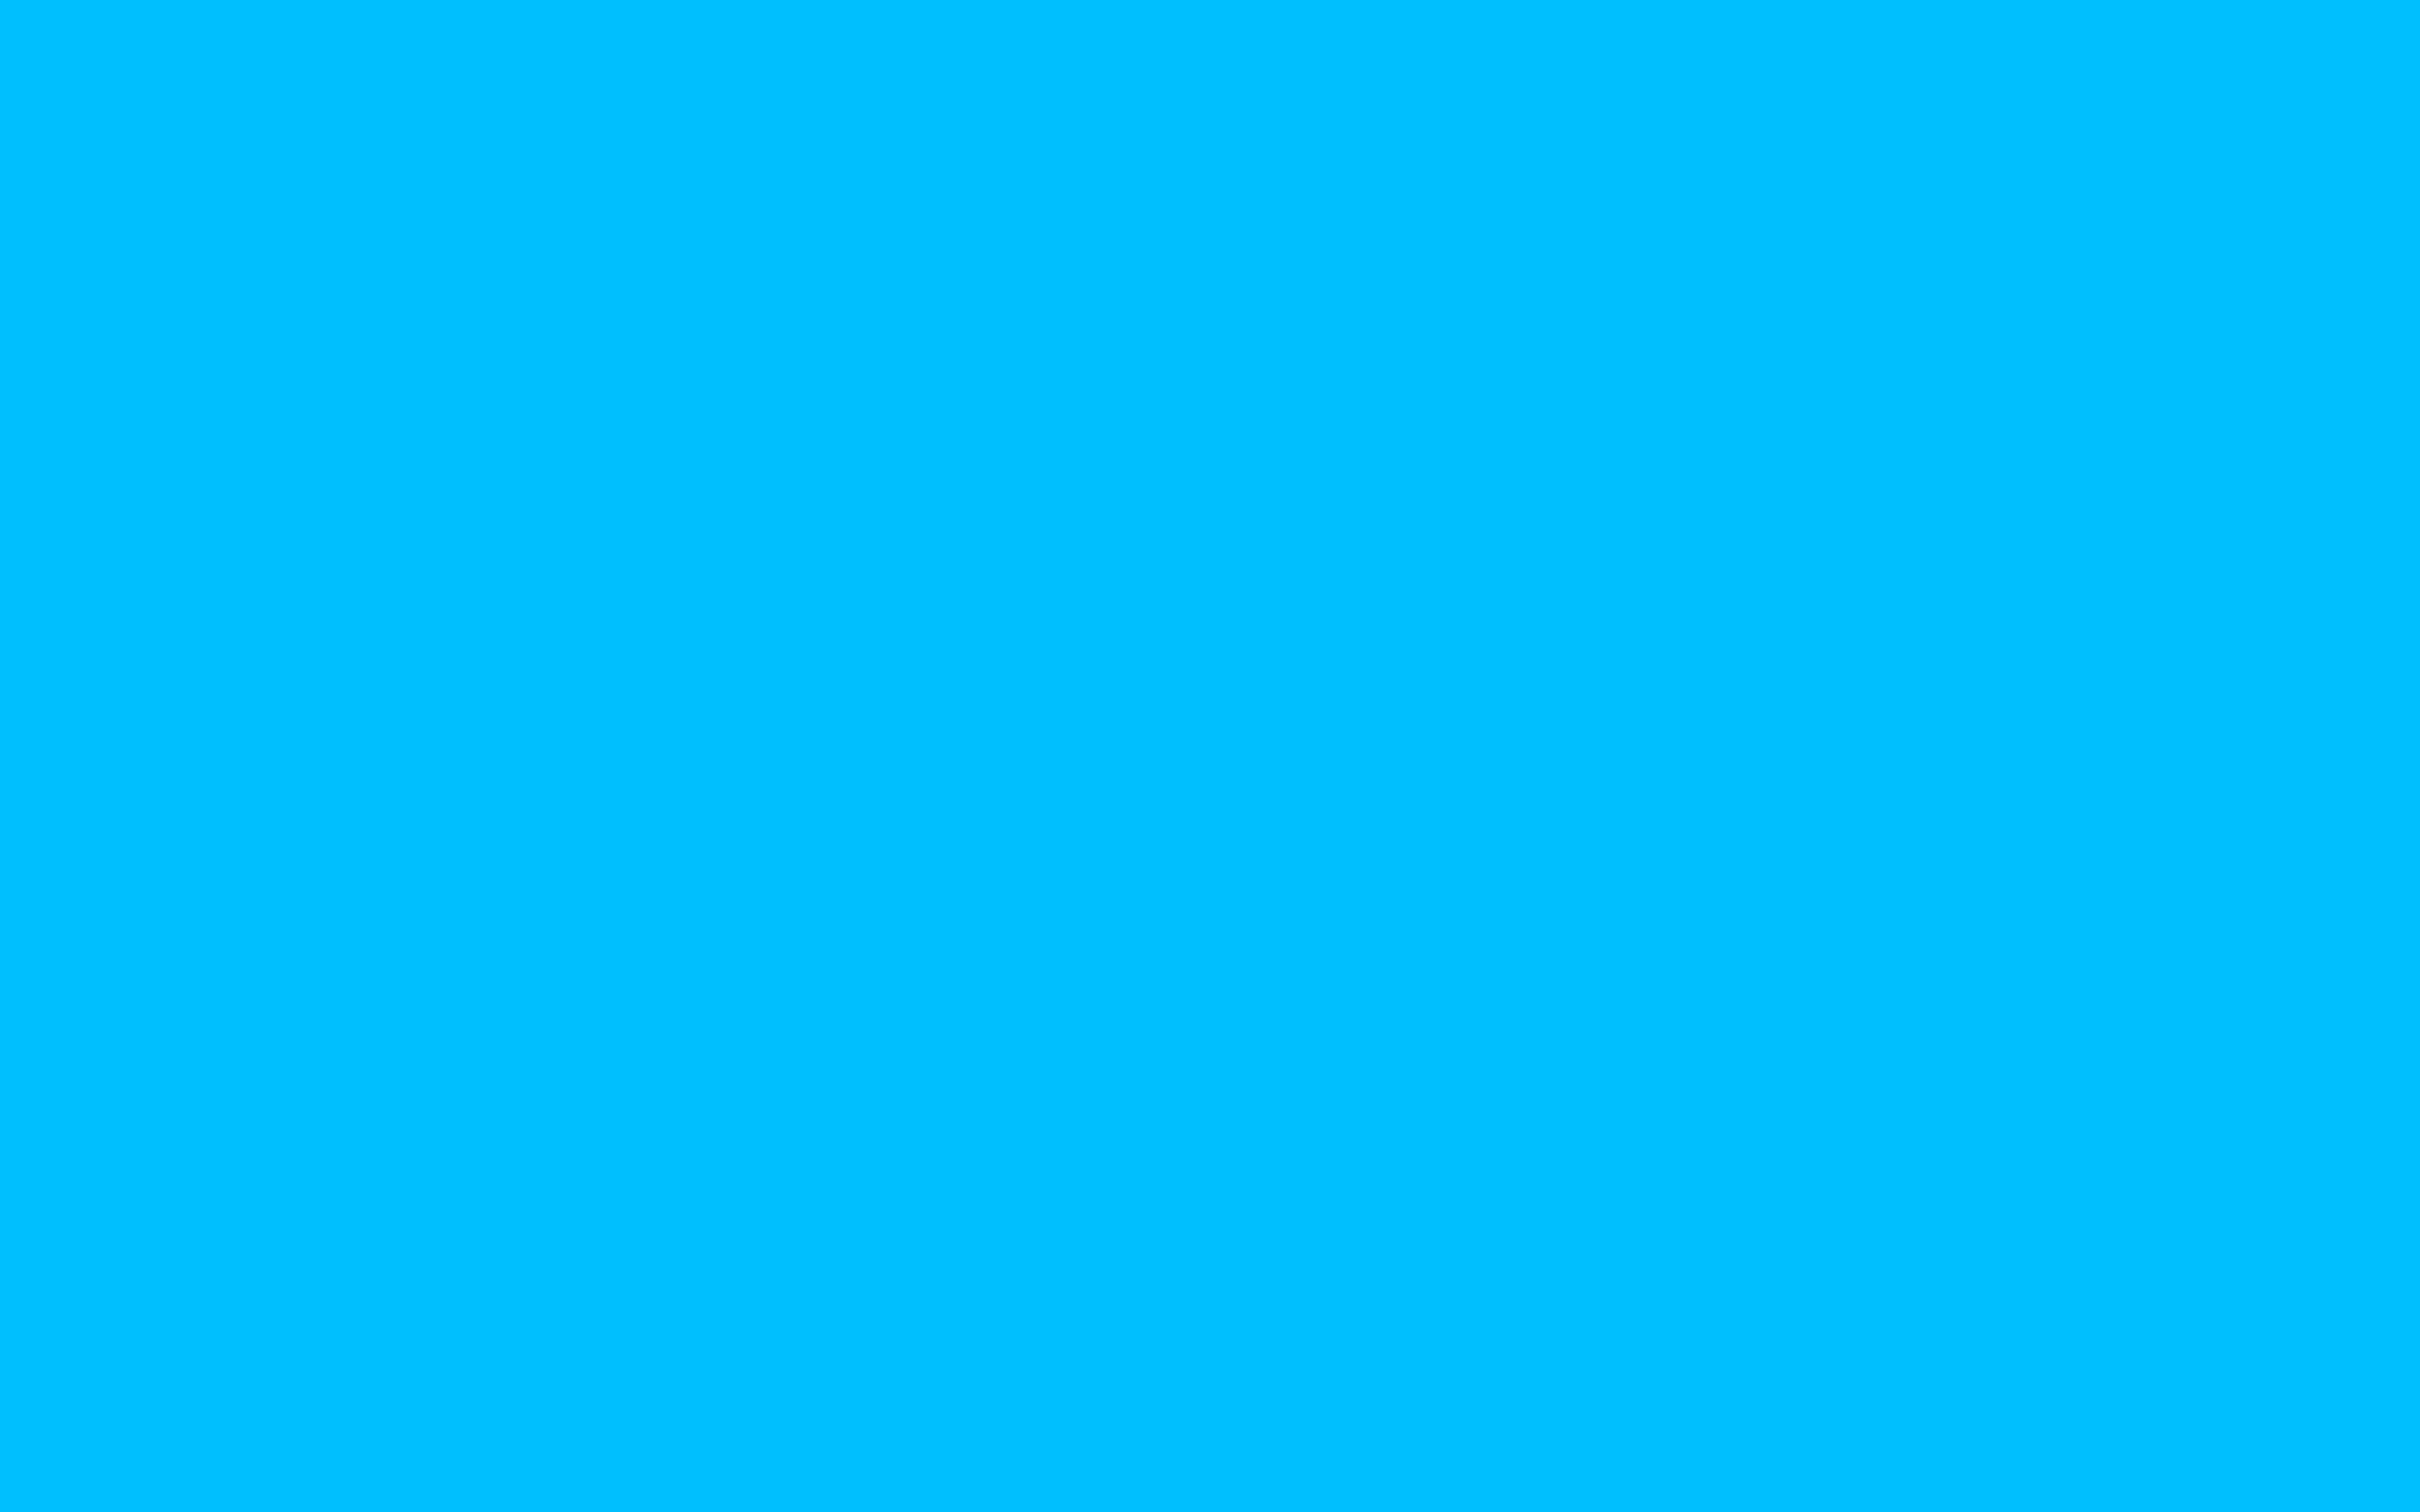 2560x1600 Capri Solid Color Background